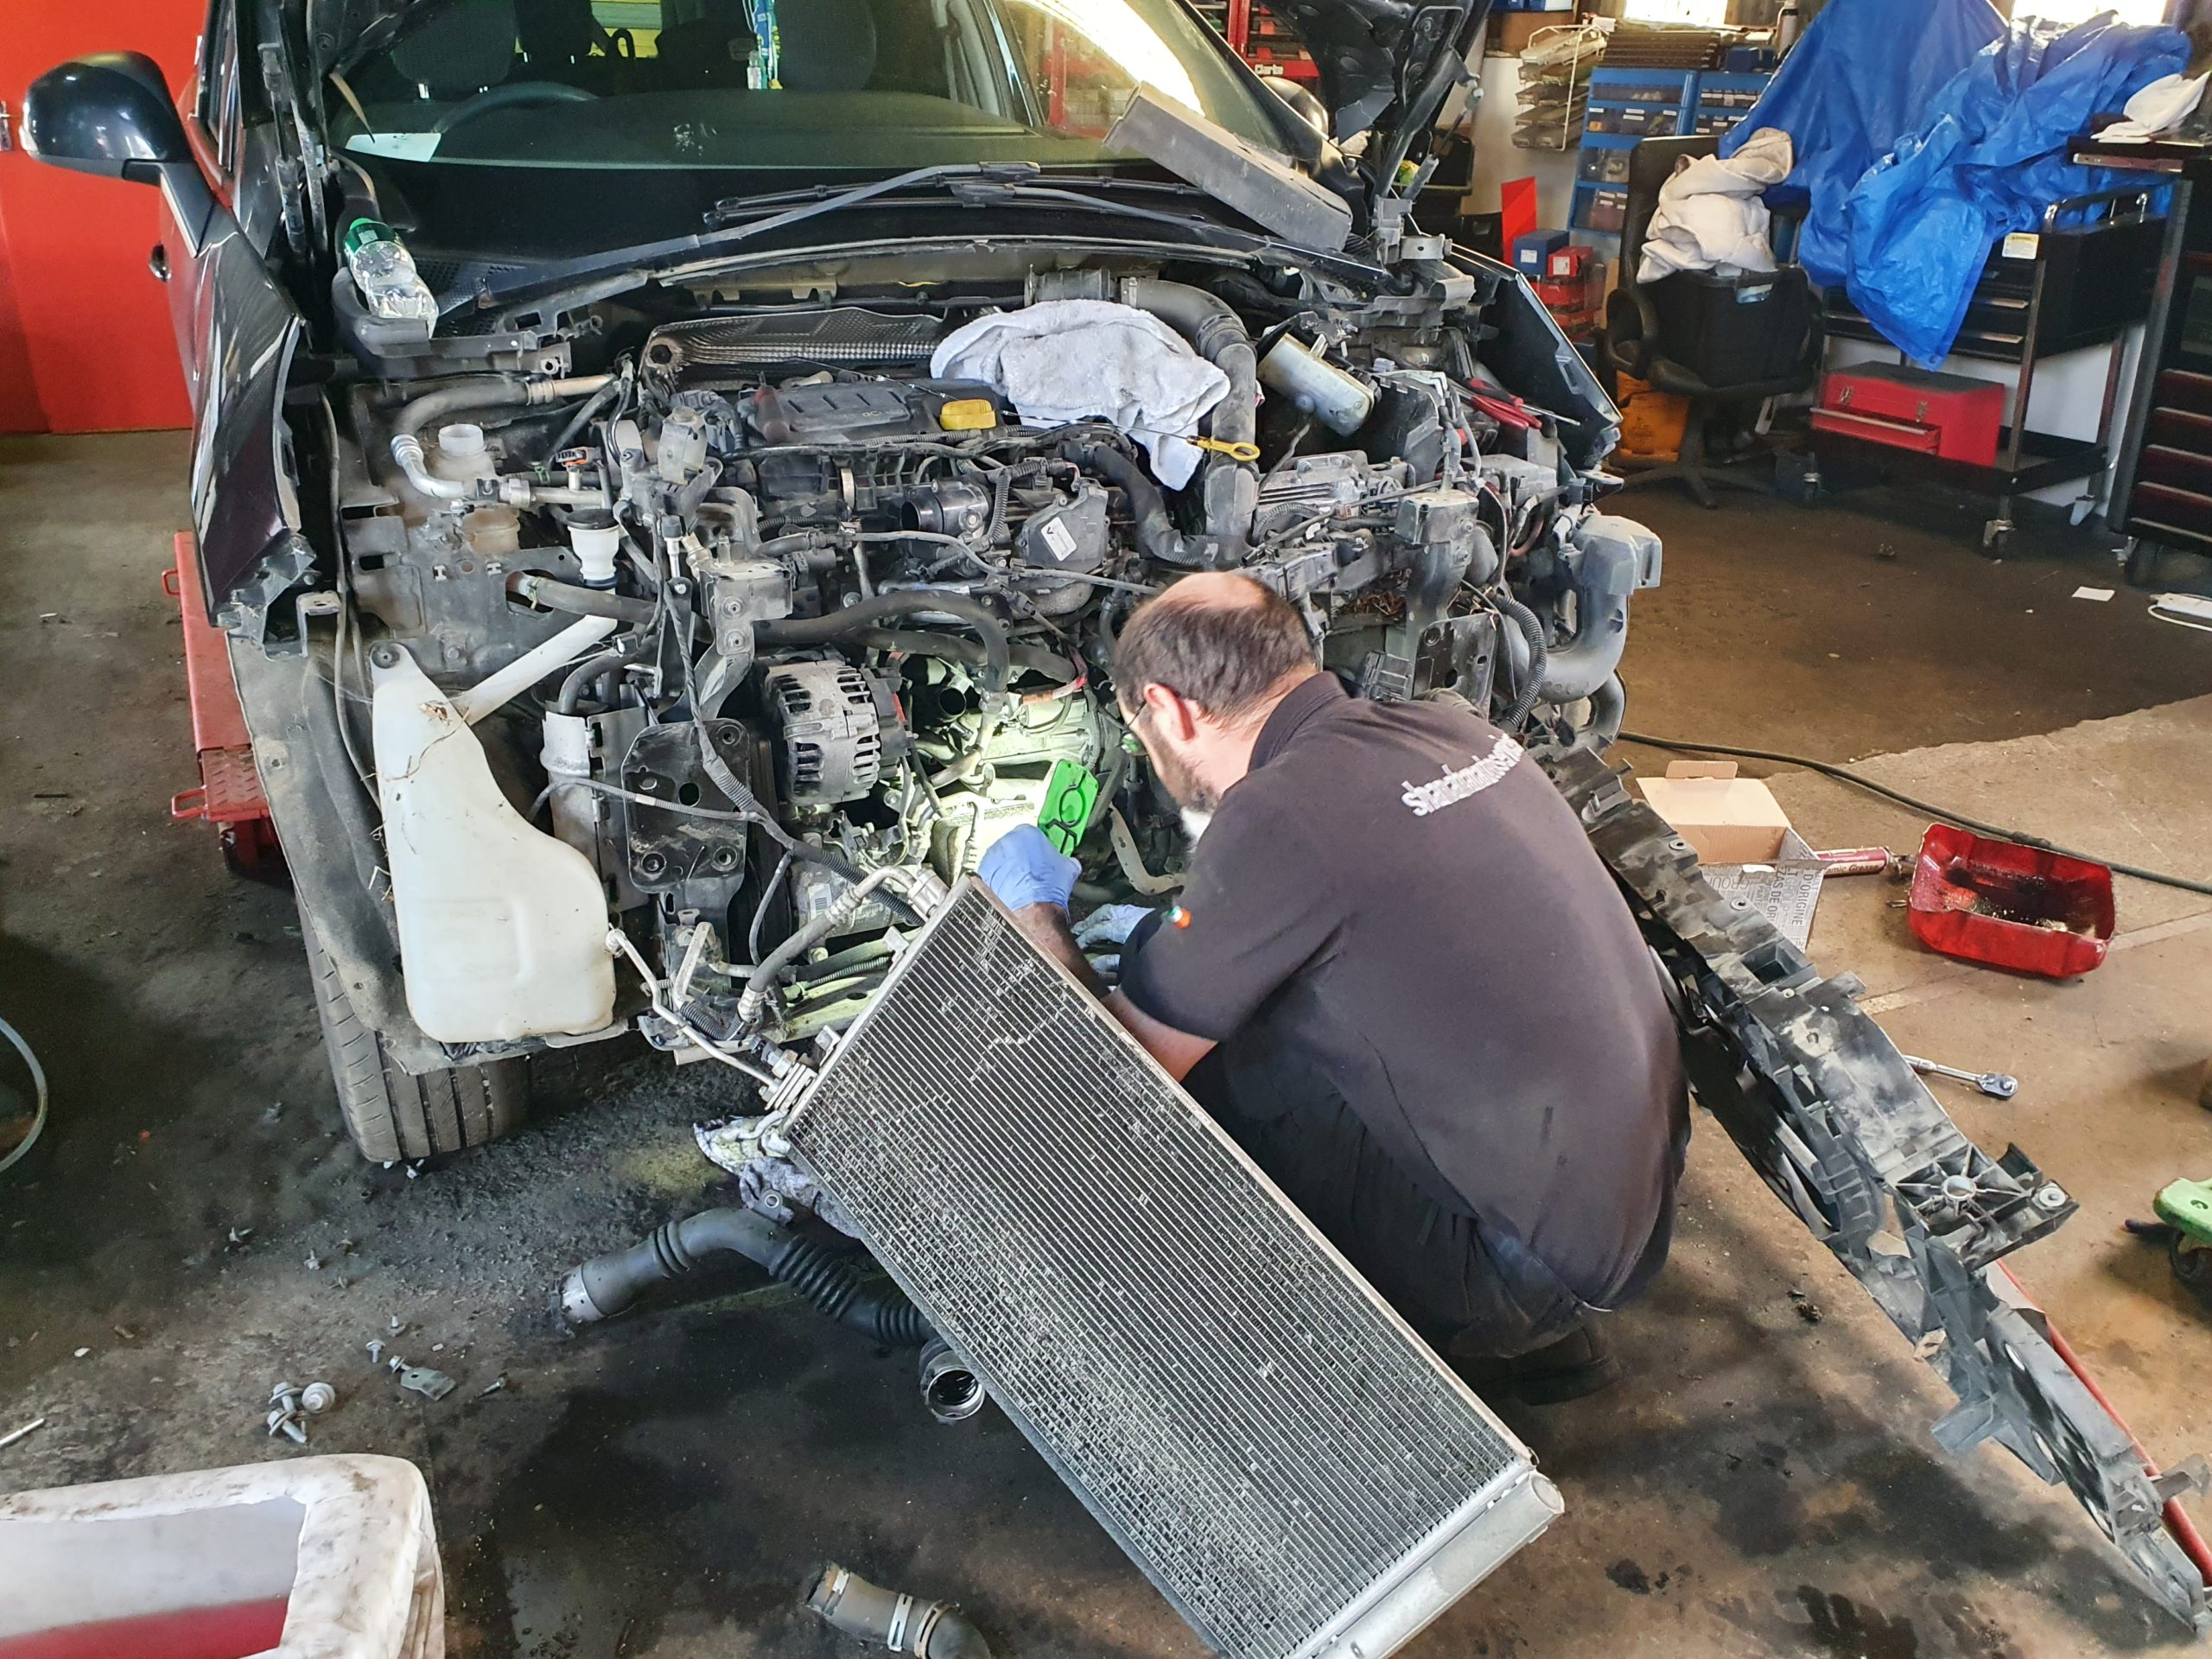 Shanahan Auto Gorey Wexford Servicing